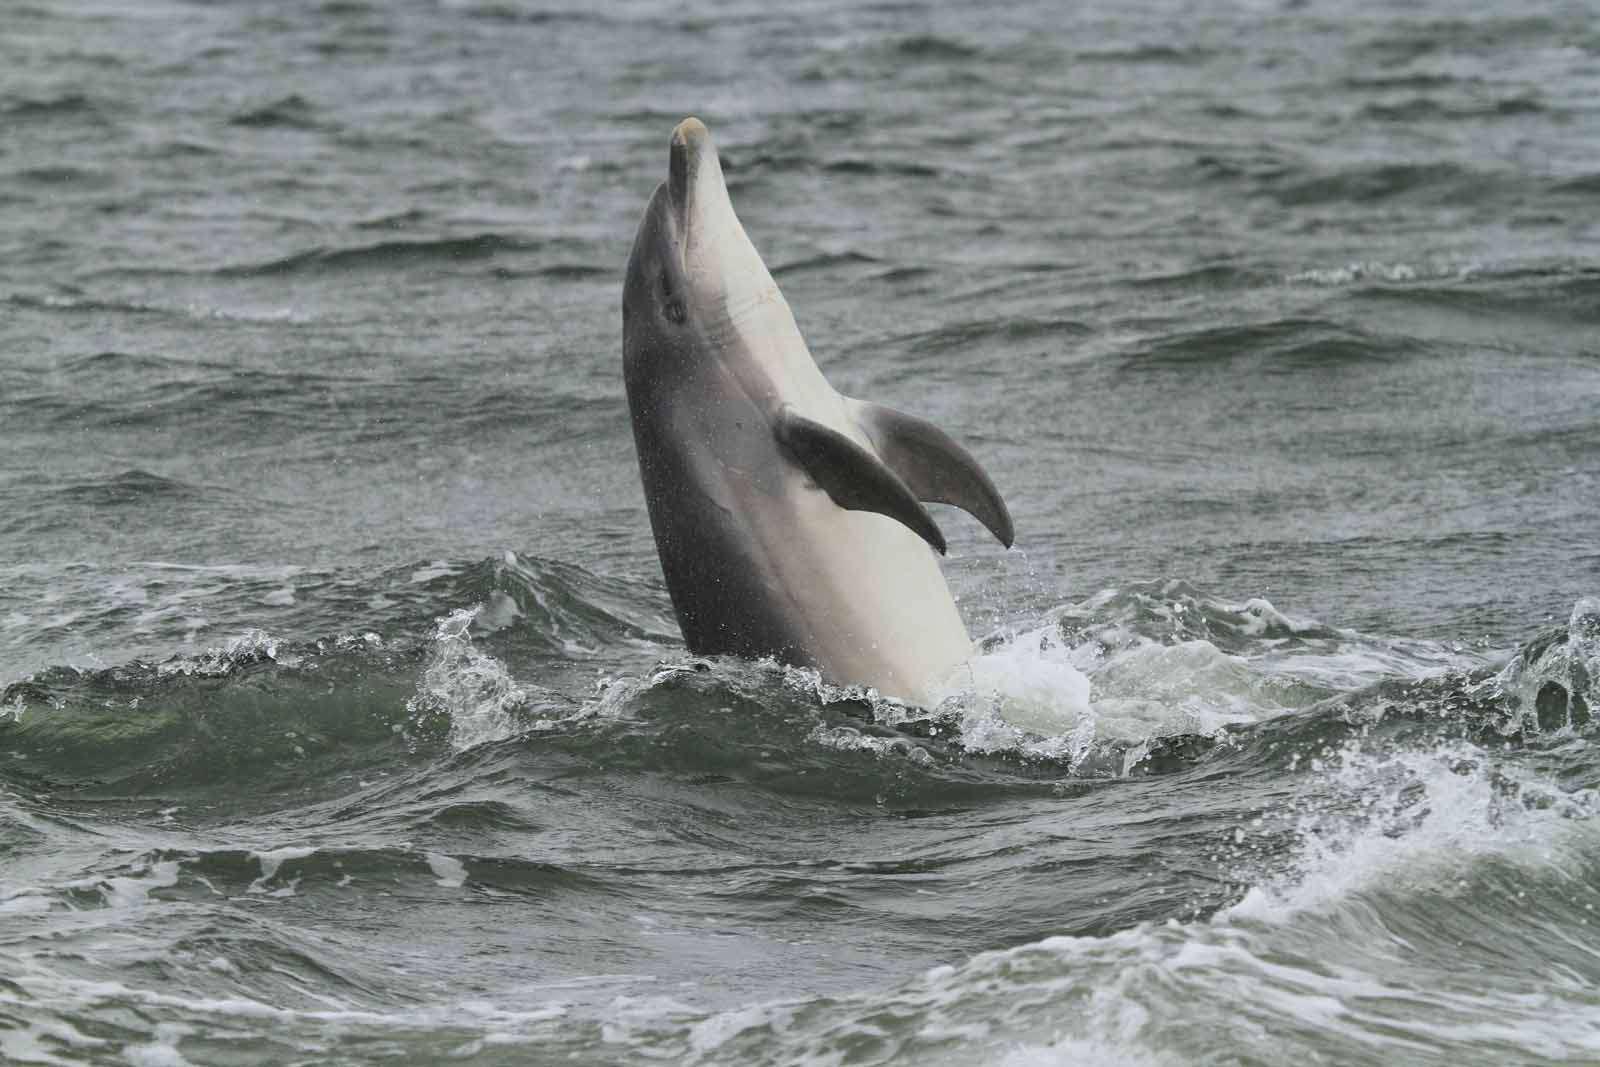 Grand dauphin (Crédits : EHolder)